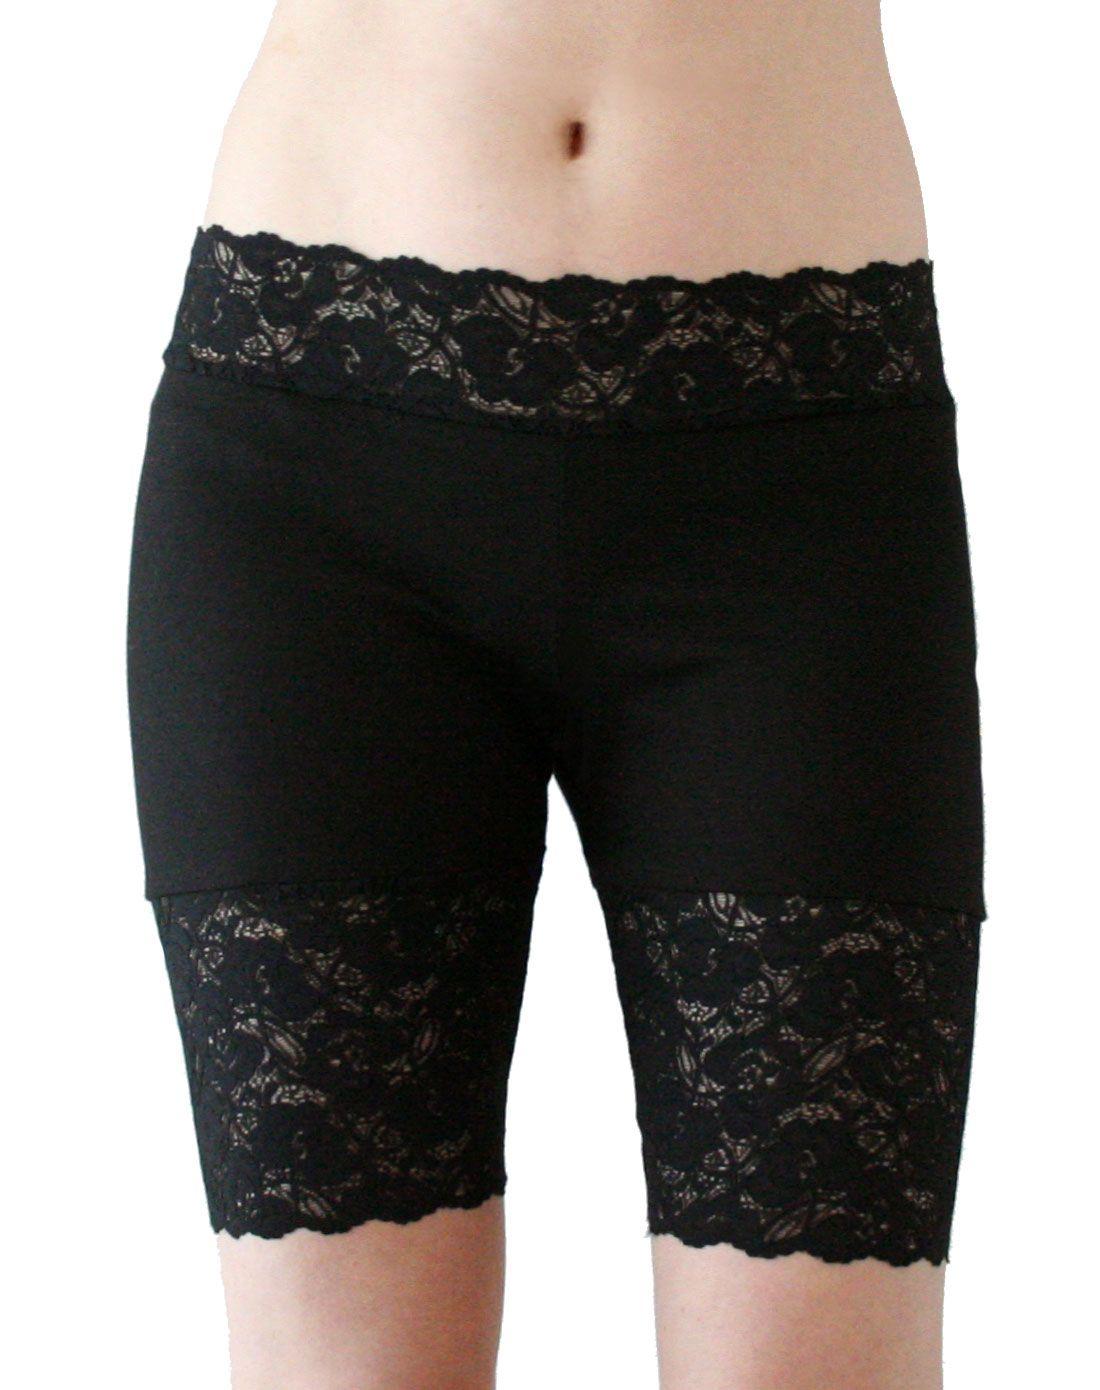 ee4740de3e09e3 Wide Waistband Black Stretch Lace Shorts high-waisted plus size goth bike  shorts XS S M L XL 2XL 3XL Short Leggings Lace Trim High Waist